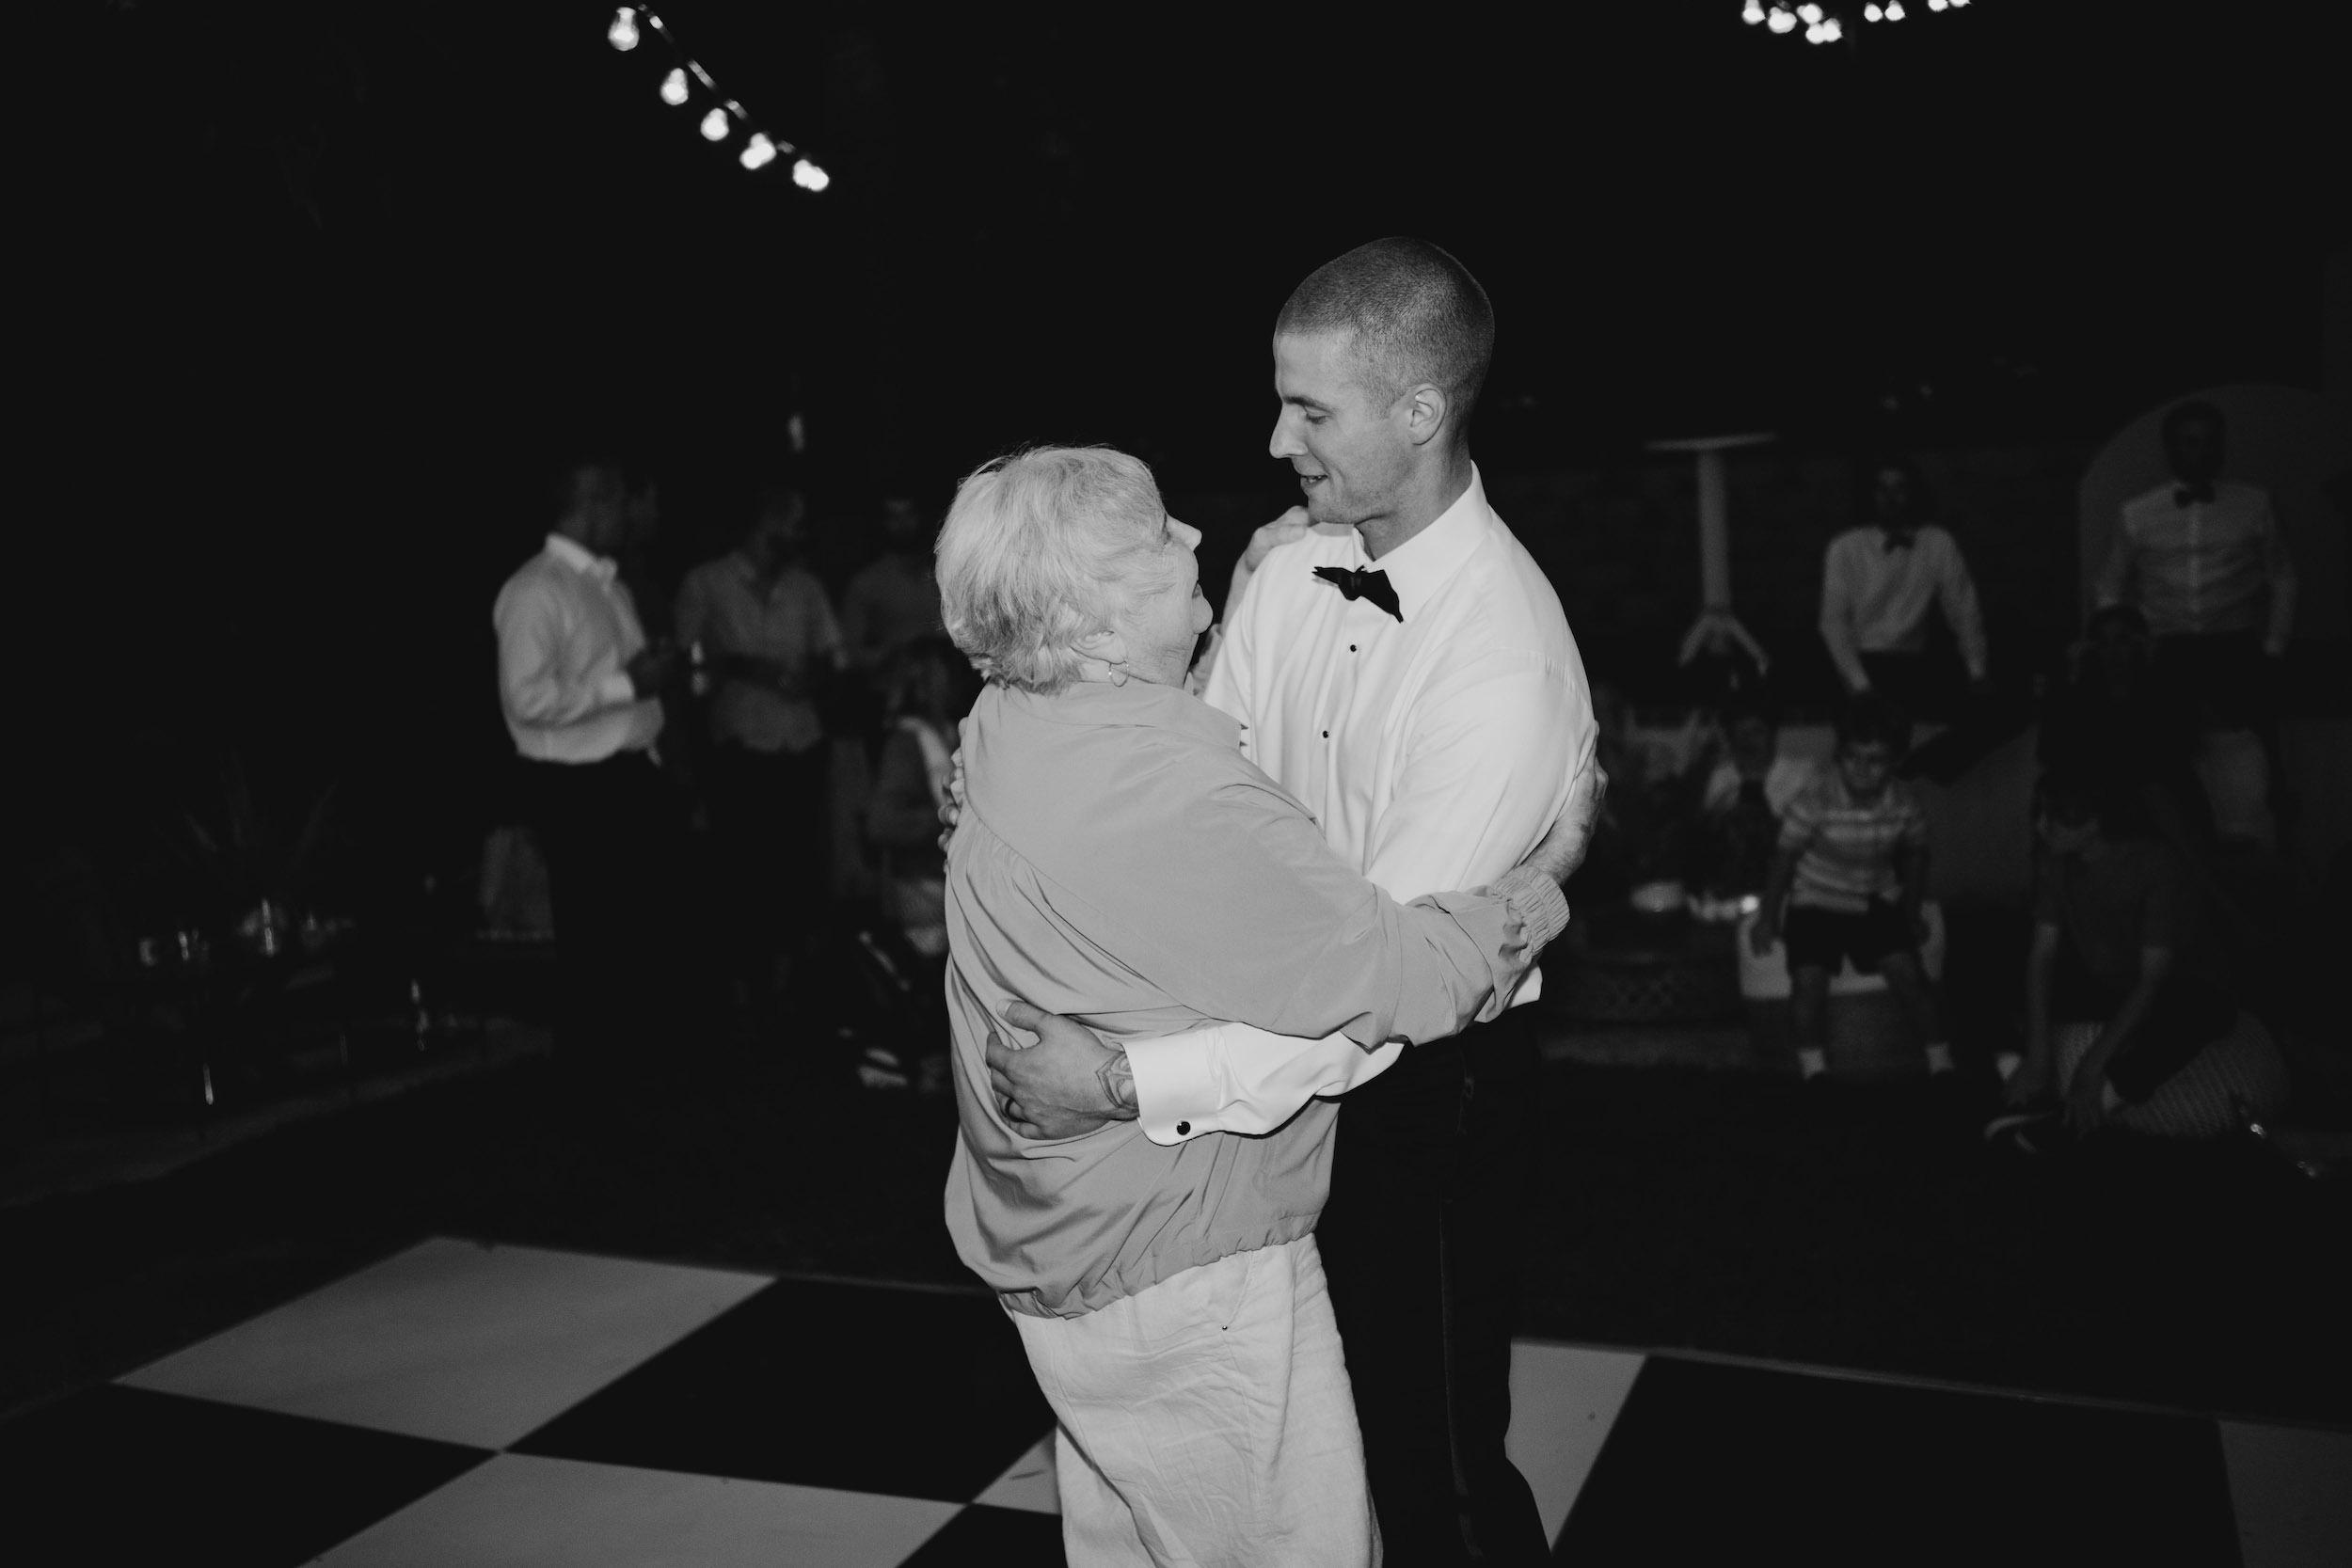 Grandma and grandson dance in Laguna Beach Backyard Wedding, image by Fatima Elreda Photo